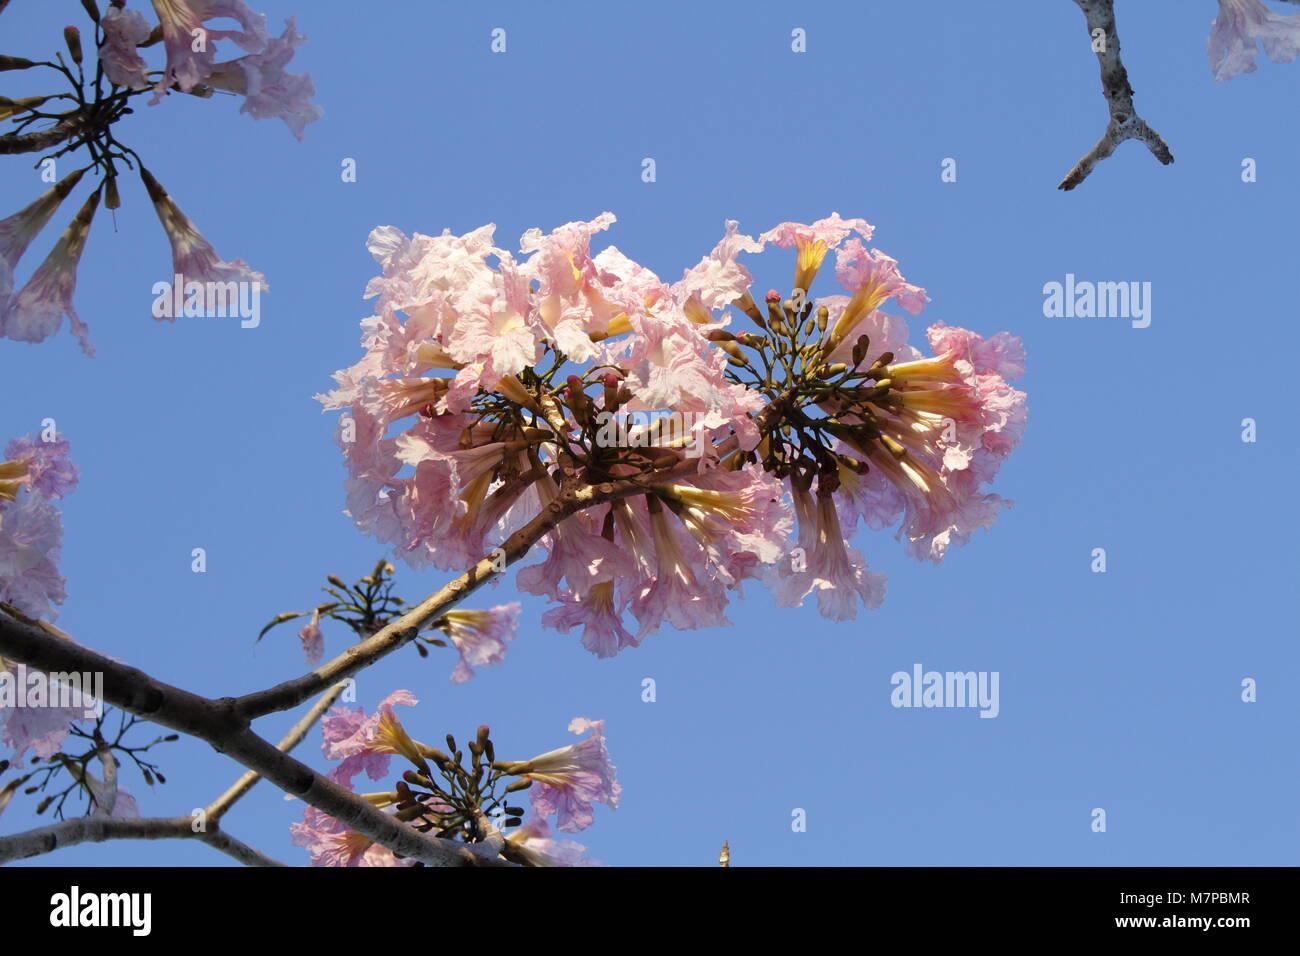 Tabebouia rosea - Stock Image